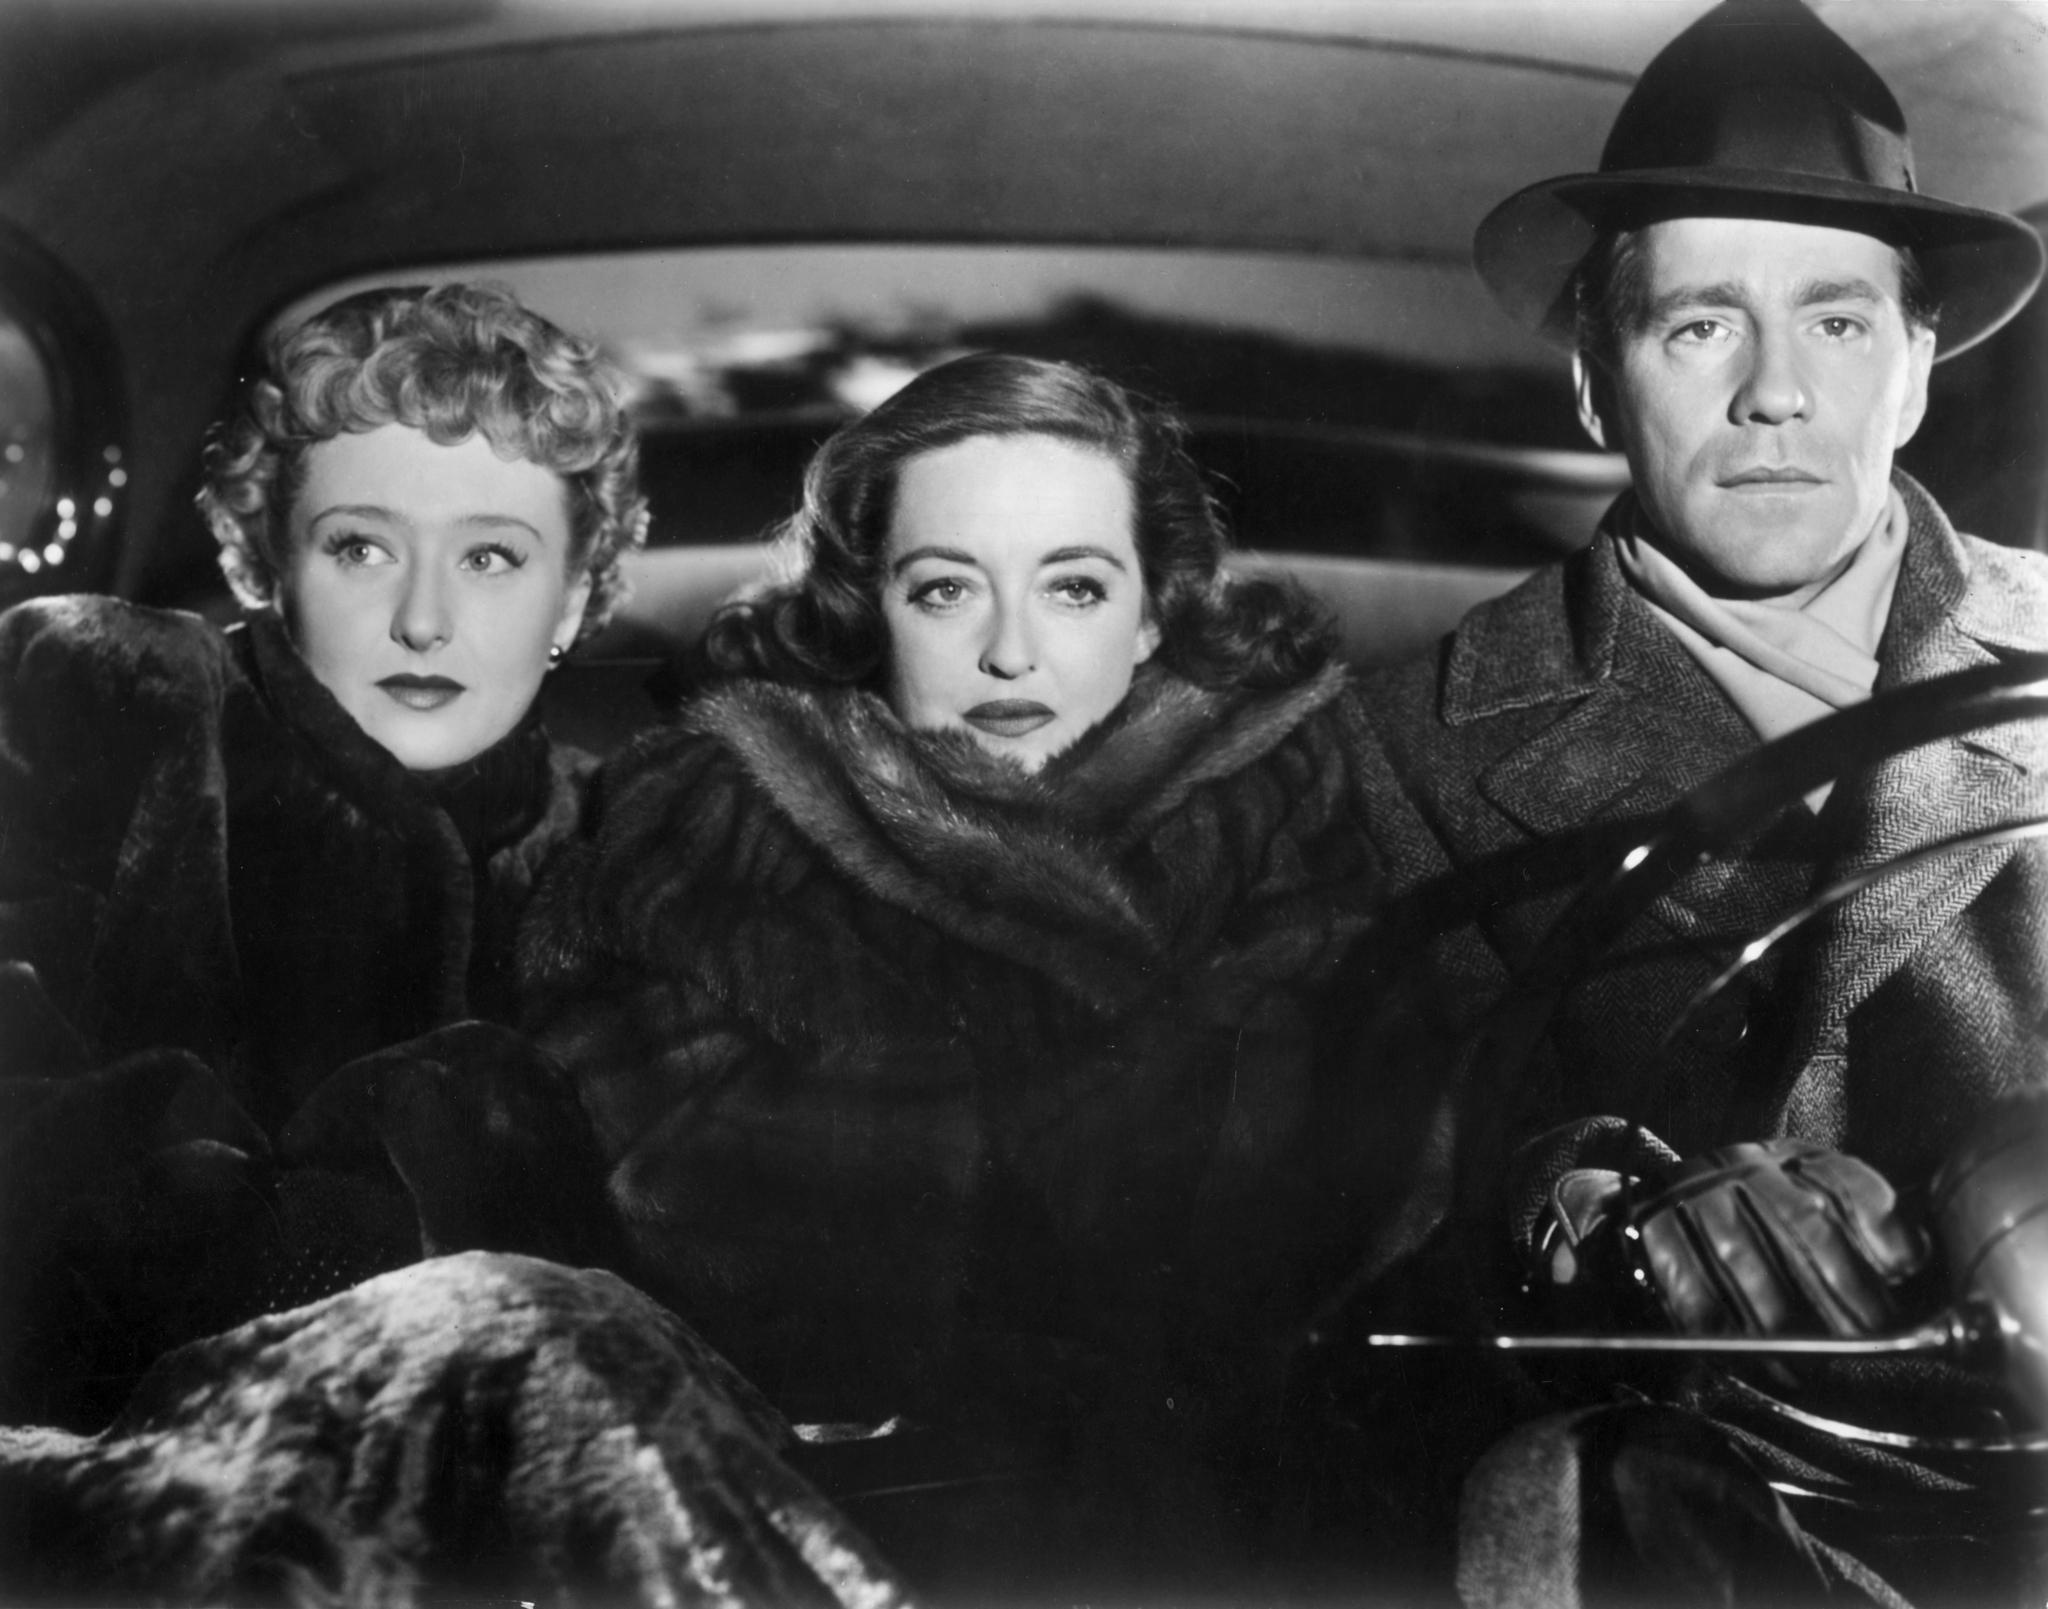 (From left) Celeste Holm, Bette Davis, Hugh Marlowe